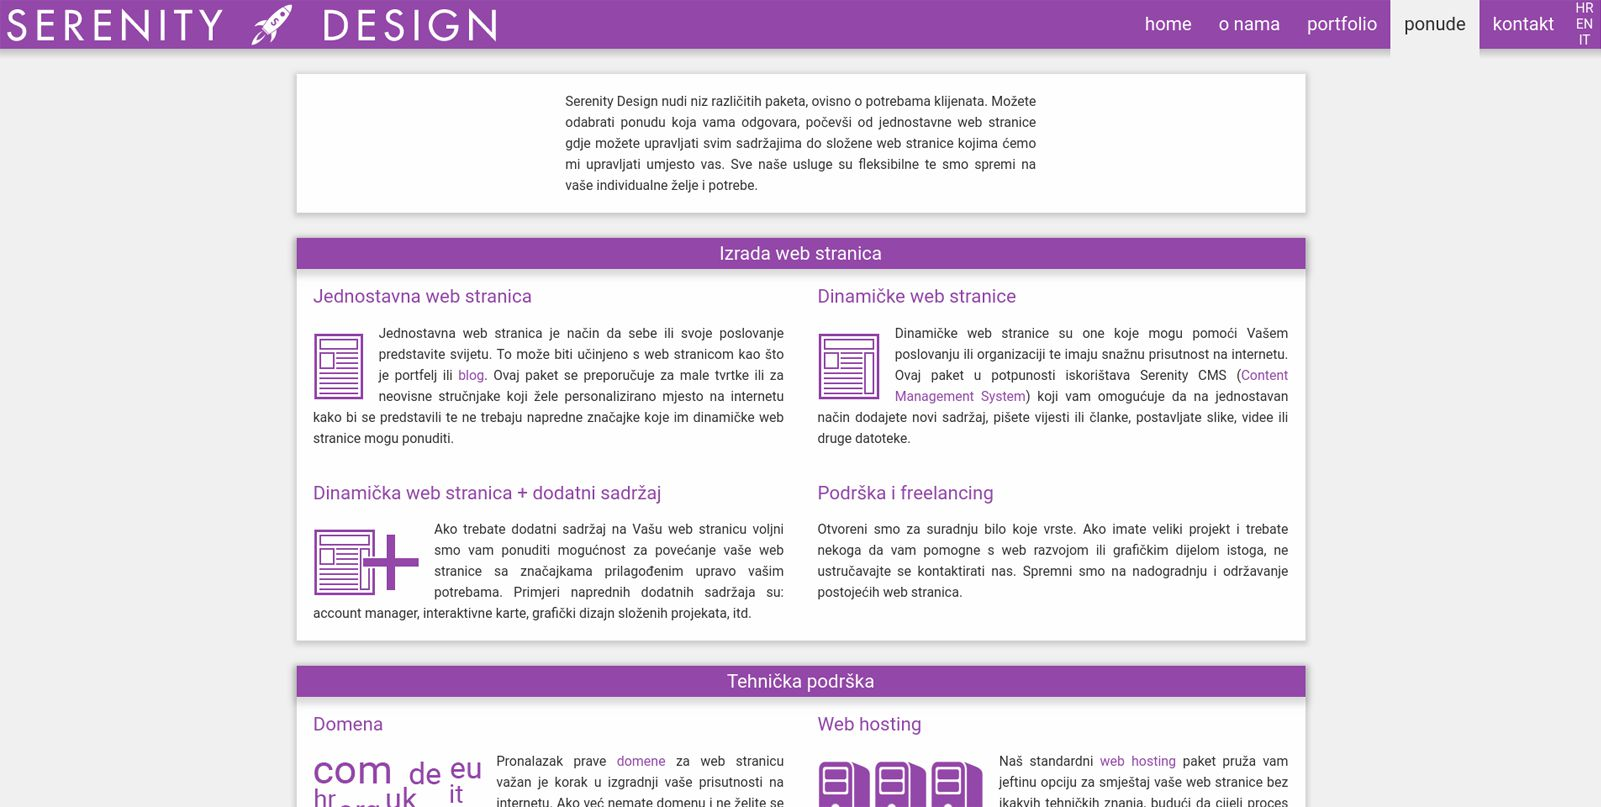 Serenity Design 3